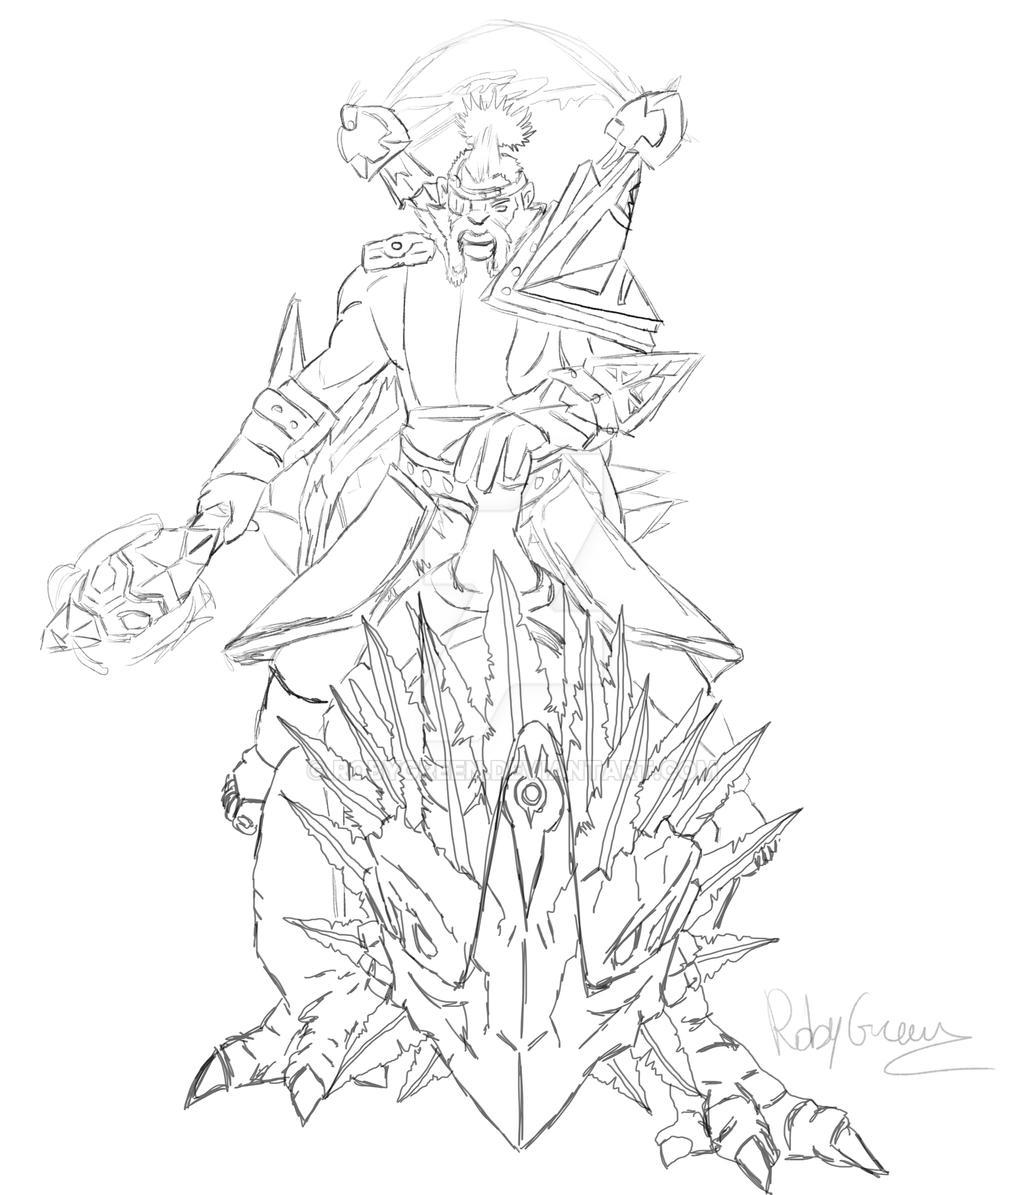 disruptor dota 2 sketch by robygreen on deviantart